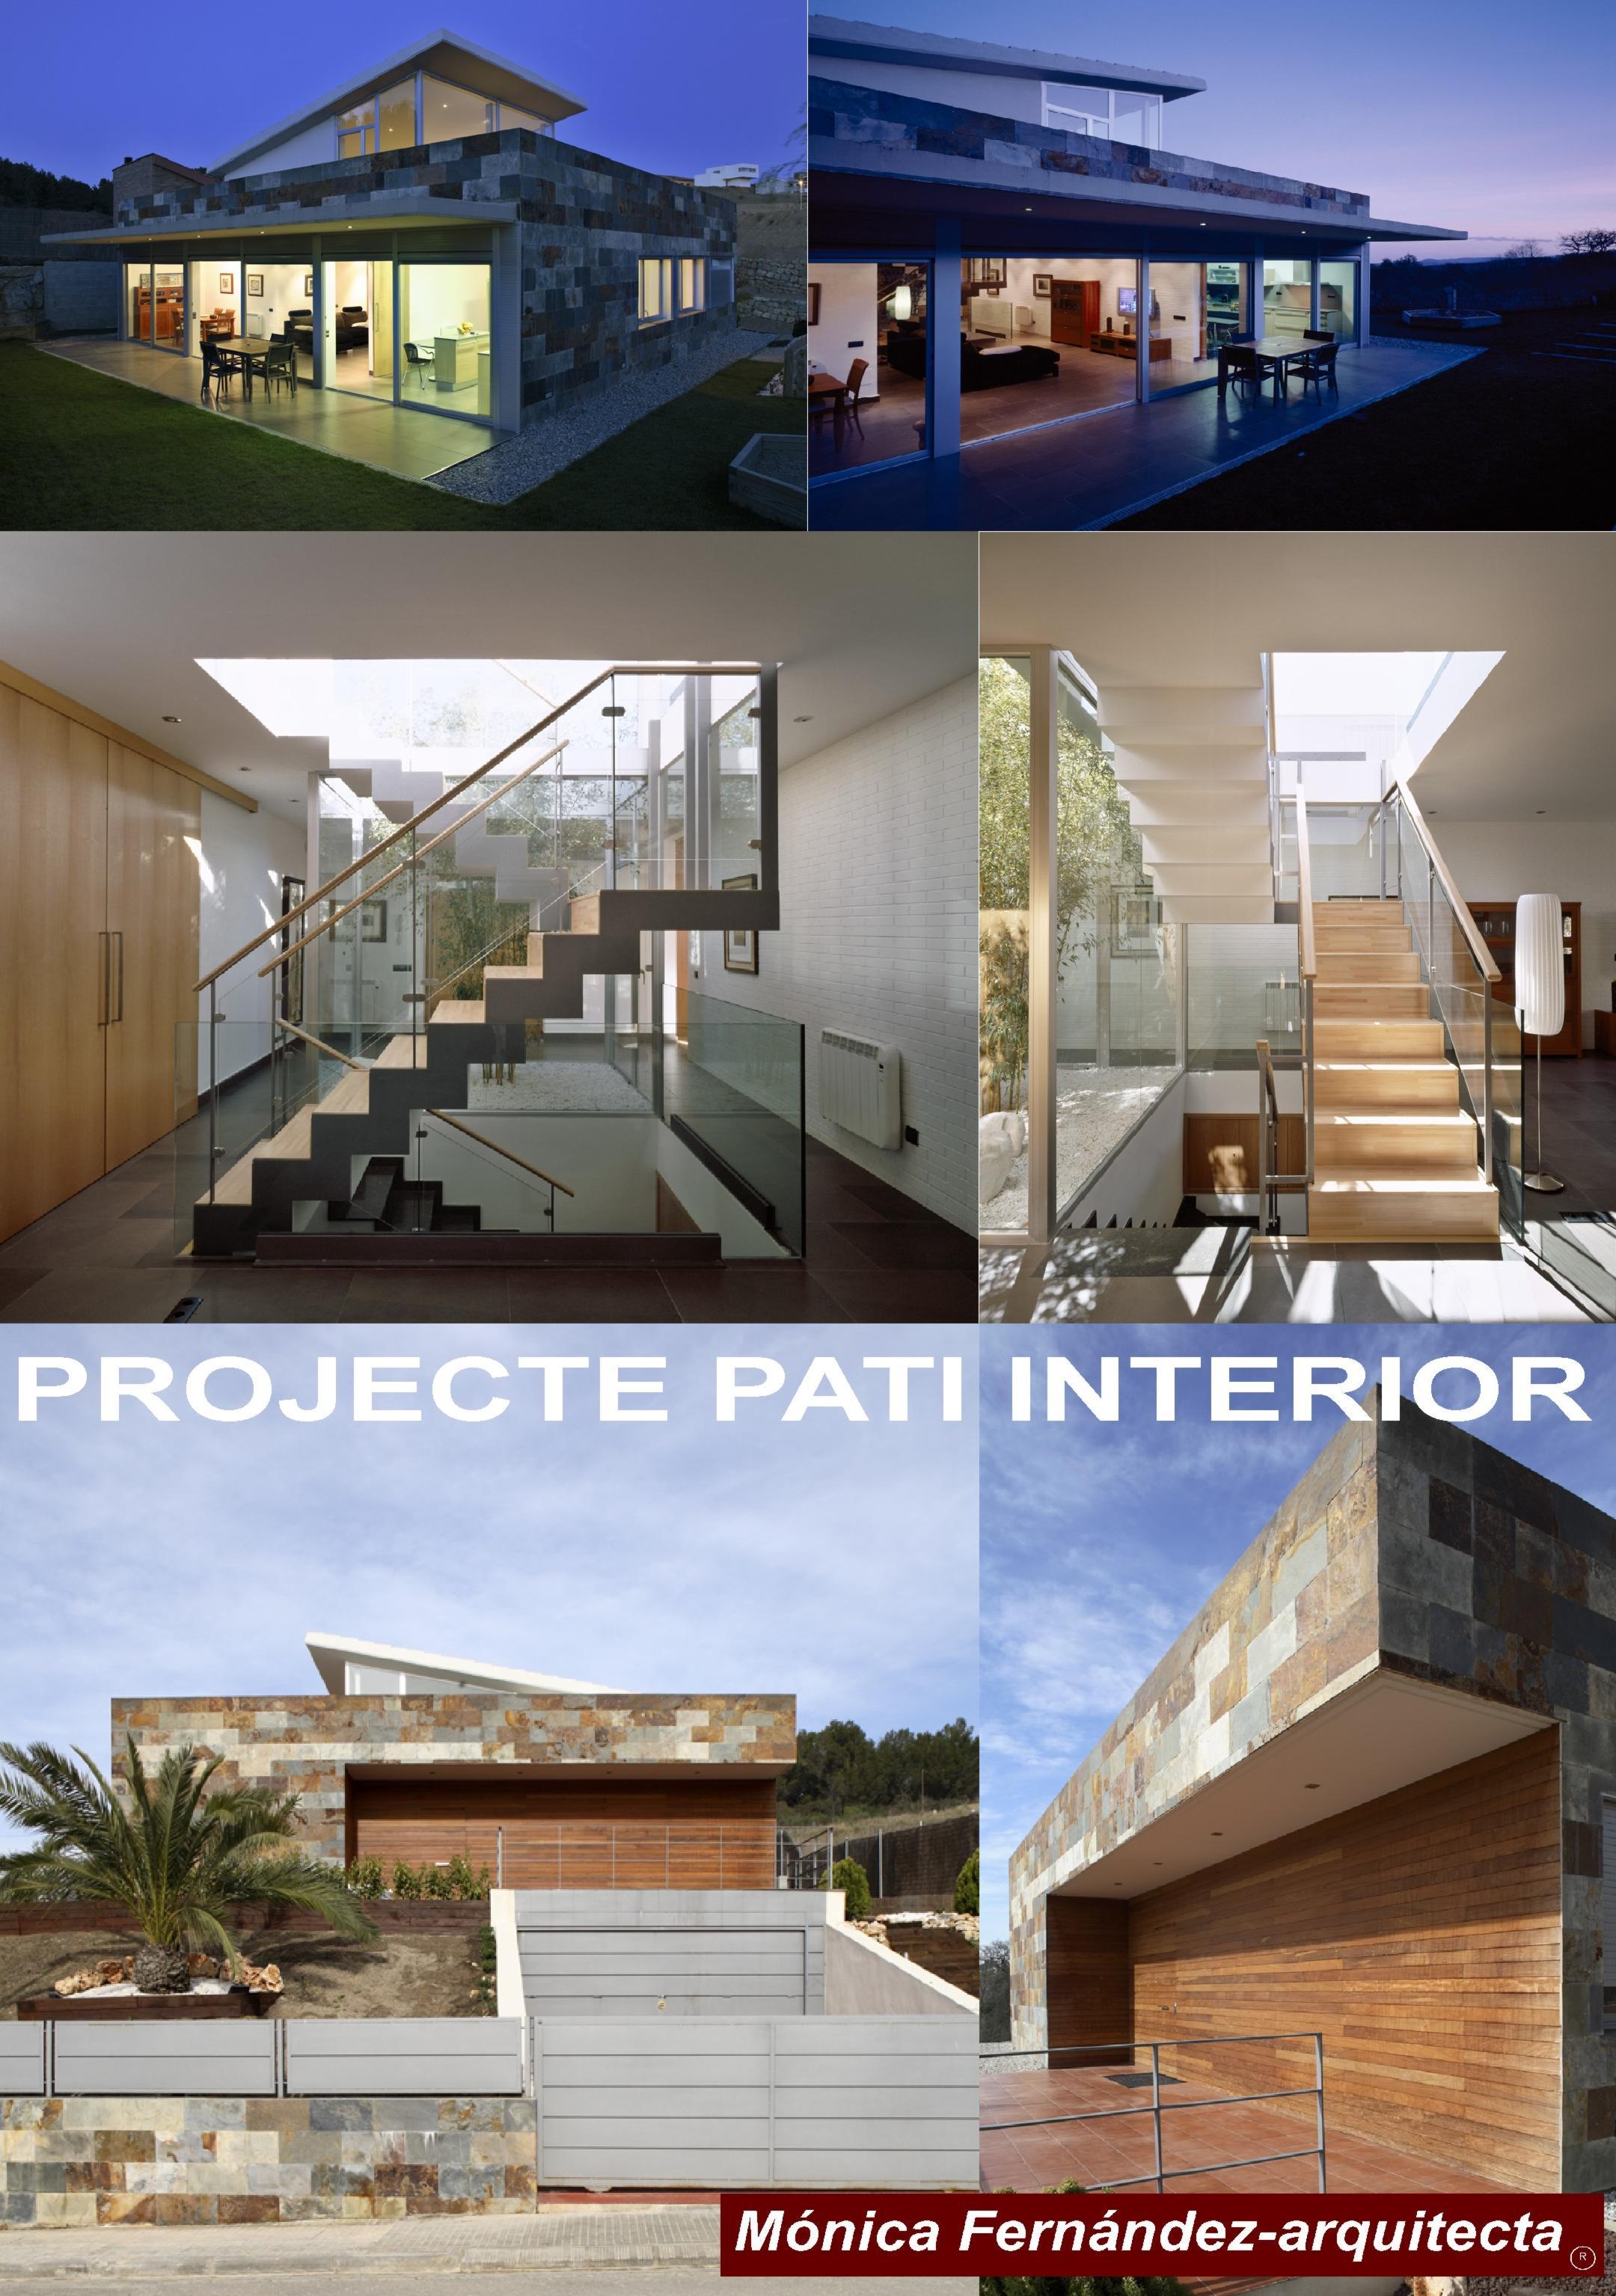 PROJECTE PATI INTERIOR Mónica Fernández-arquitecta